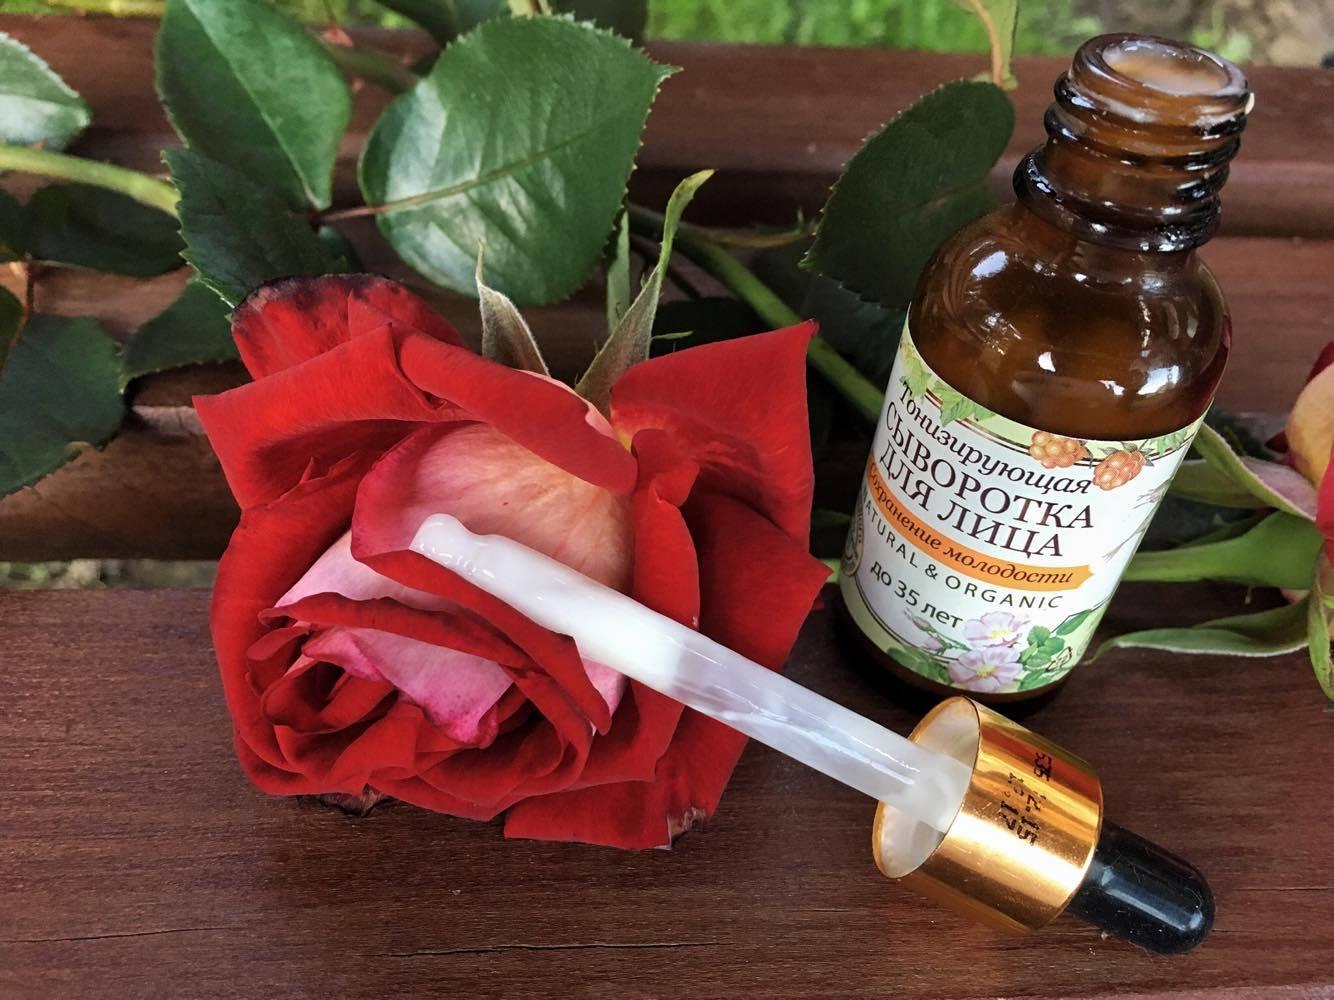 serum tonizująca Bania Agafia annemarie